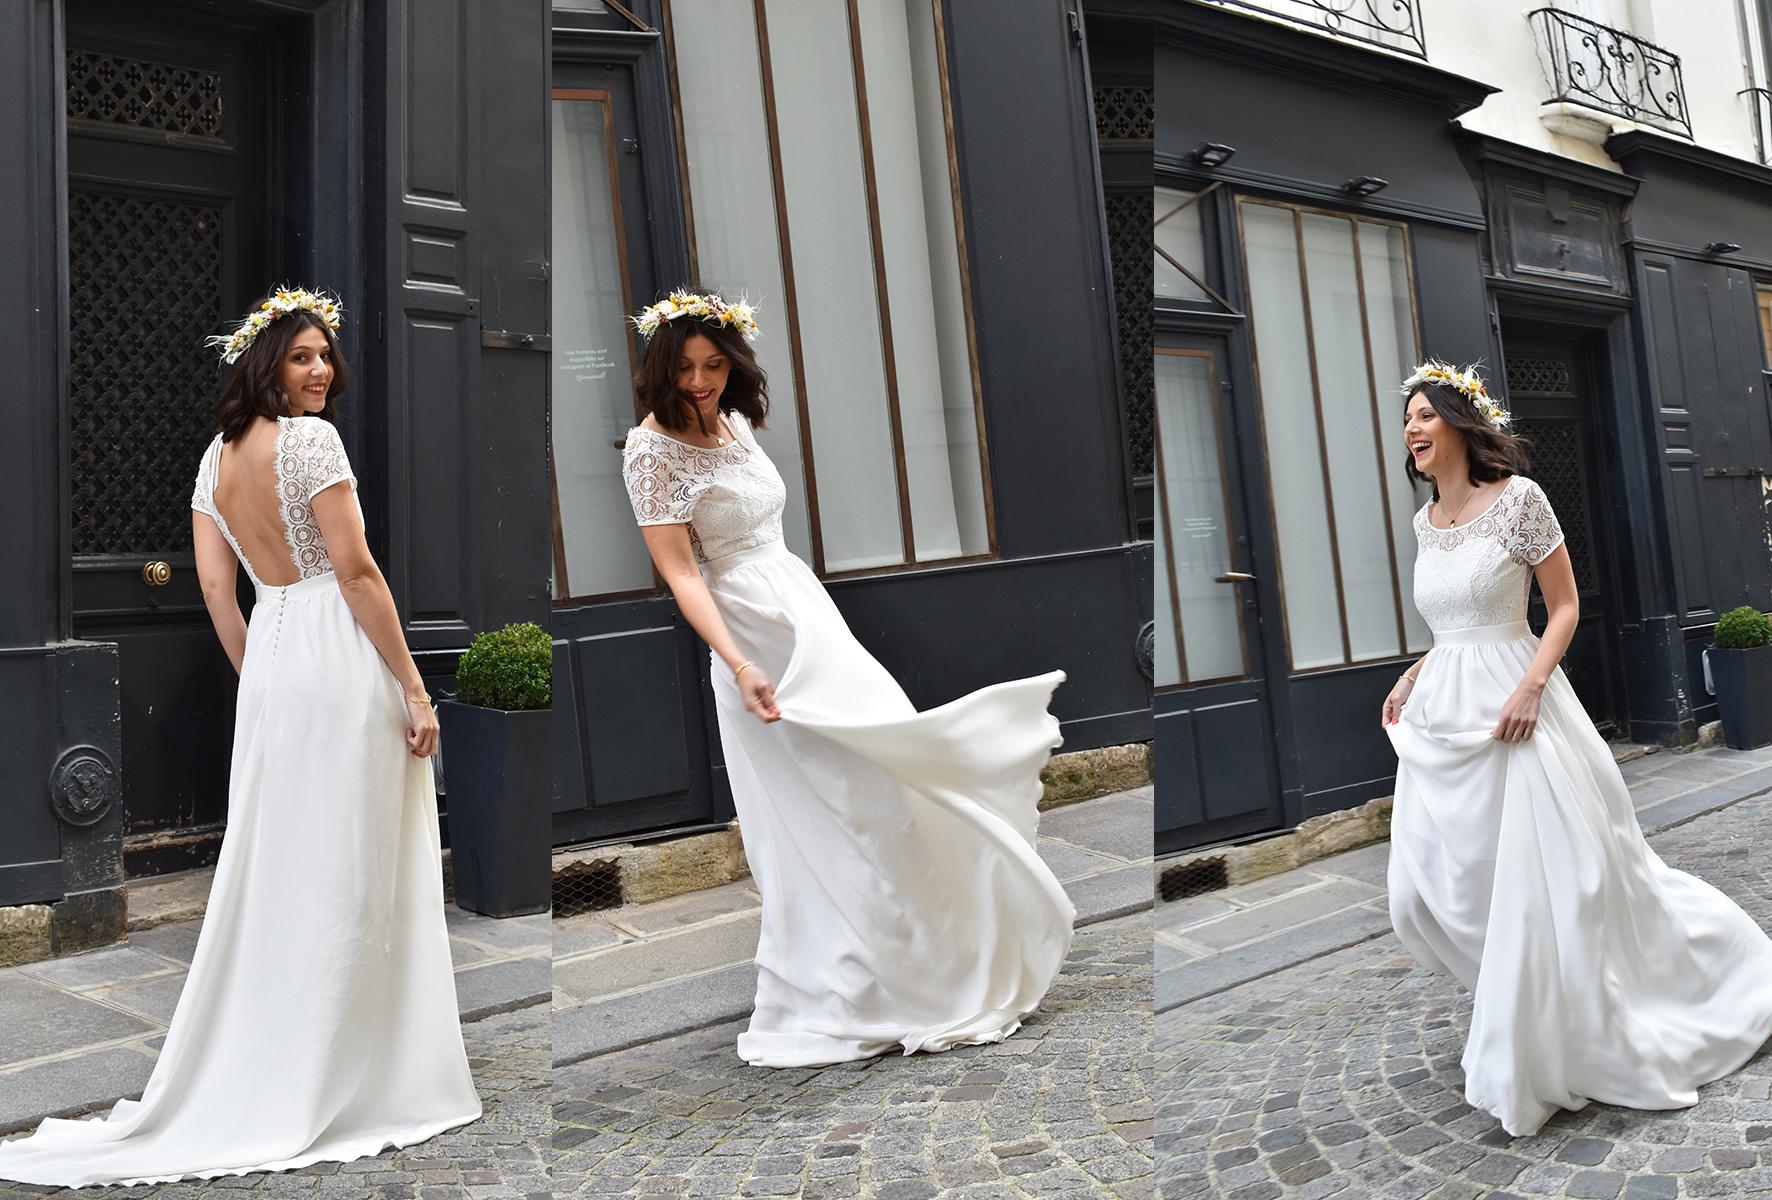 J'apprends à coudre ma robe de mariée - Artesane